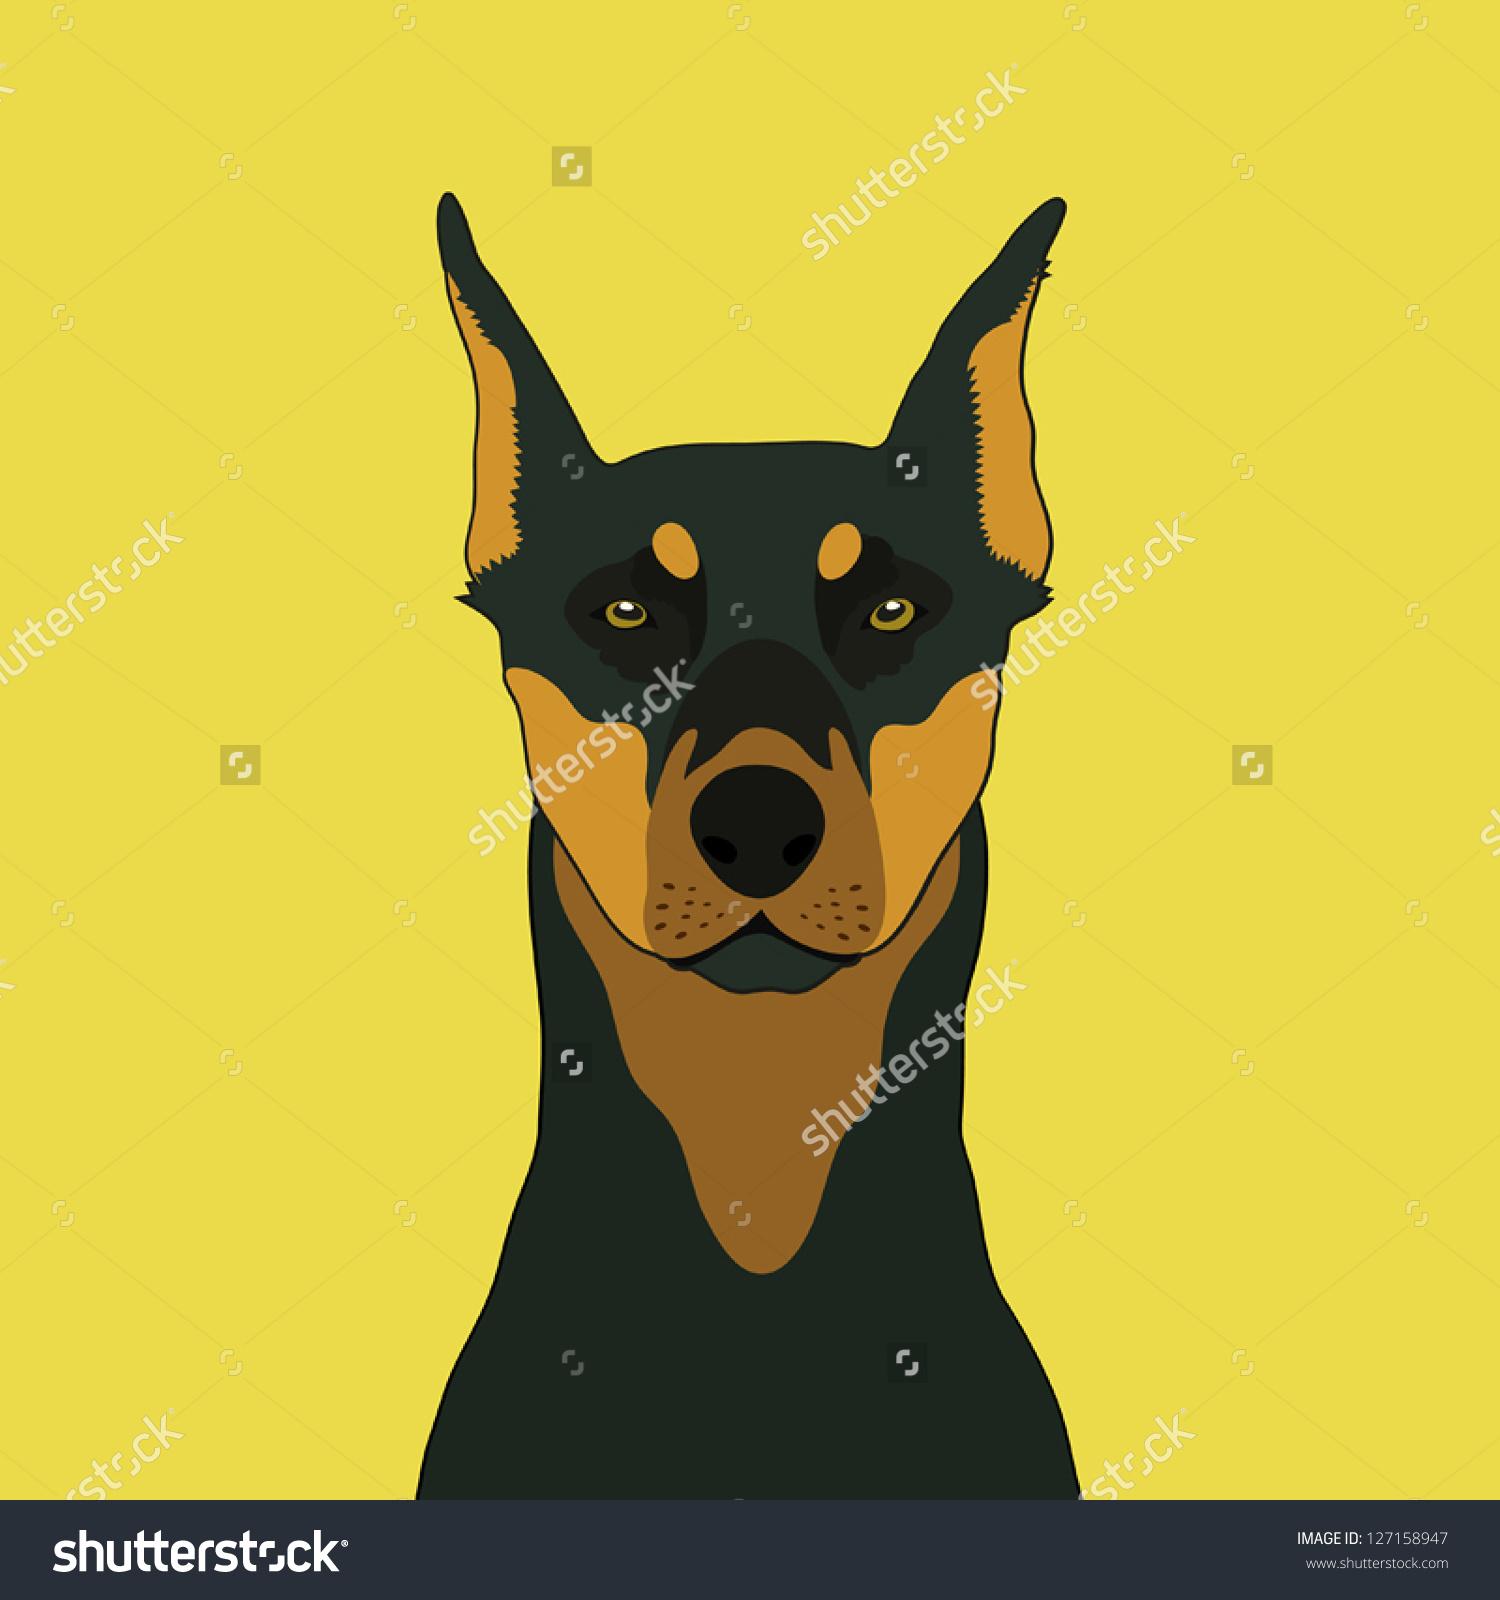 Buddy the dog clipart svg freeuse stock Buddy the dog clipart - ClipartFest svg freeuse stock